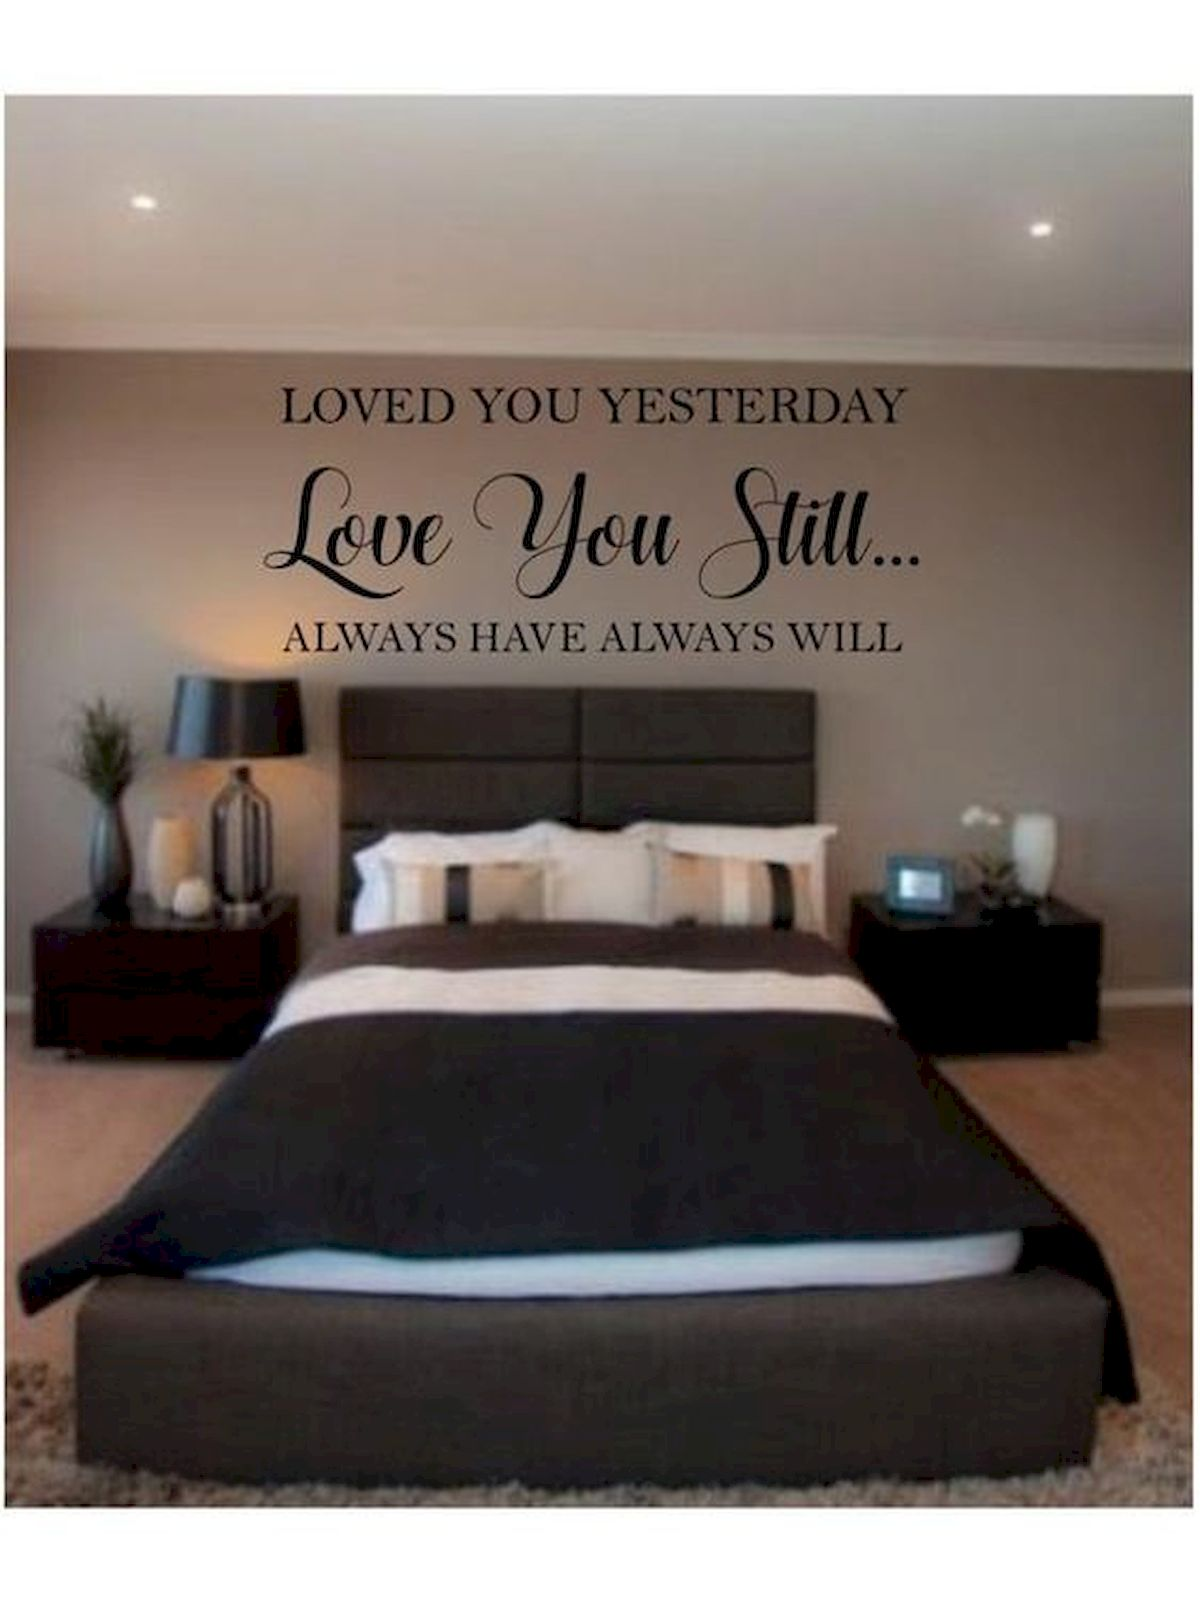 Couple Bedroom Design: 55 Romantic Bedroom Decor For Couple (53)